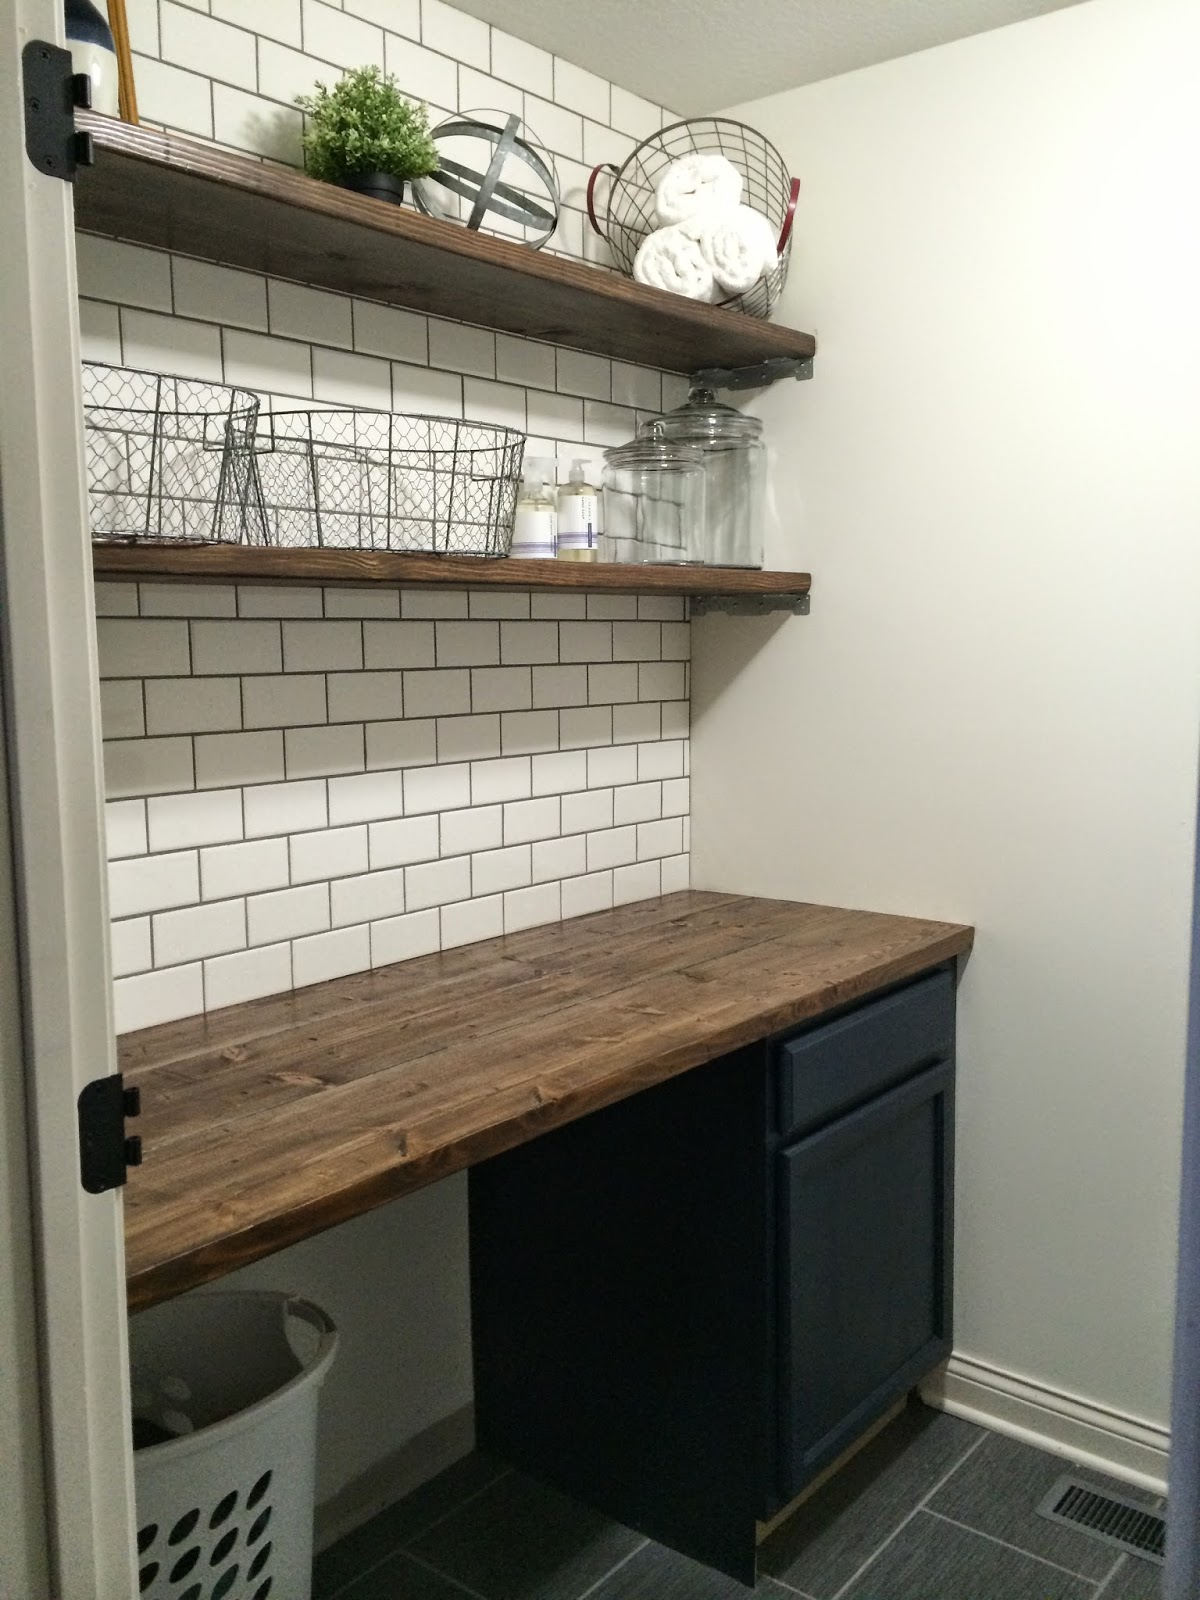 Modern farmhouse laundry room ideas (2) | Rustic bathroom ...